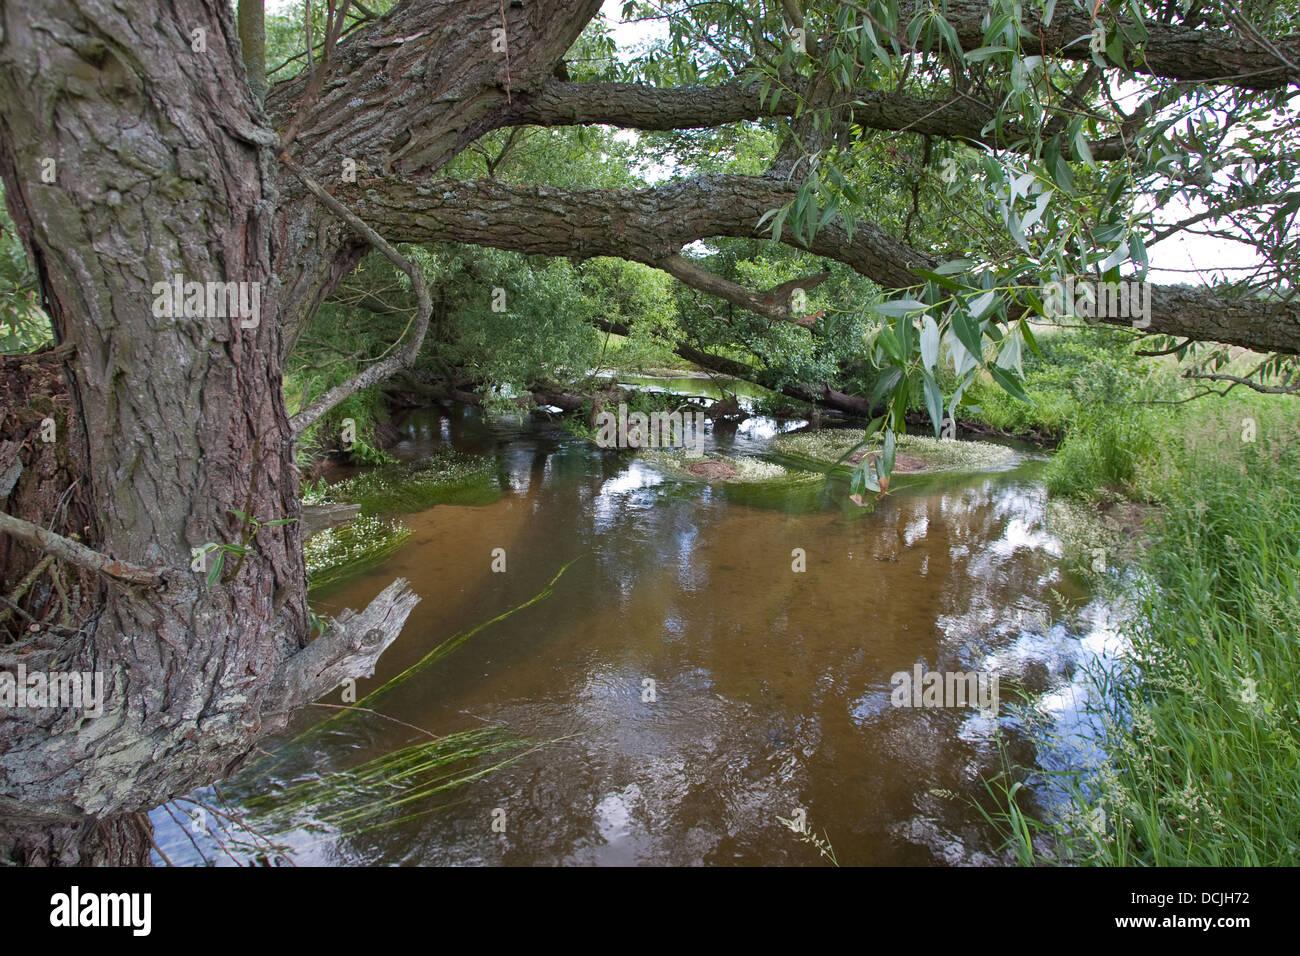 Brook, river, rivulet, stream, Naturnaher Flachlandbach, Bach, Fluß, Fluss - Stock Image